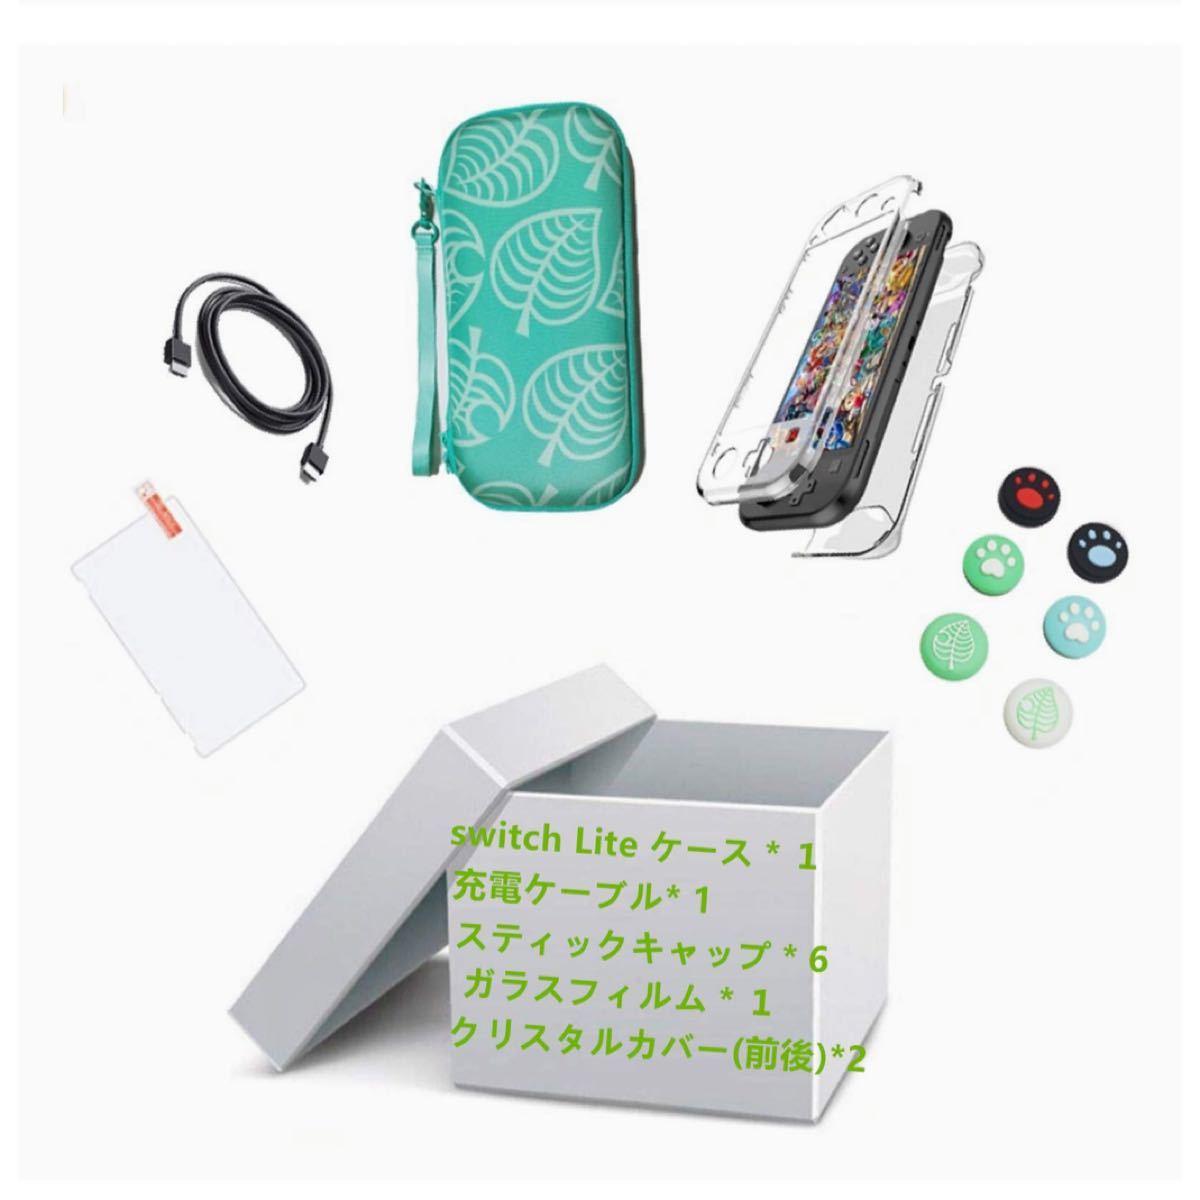 Nintendo Switch Lite ケース 任天堂スイッチ専用収納